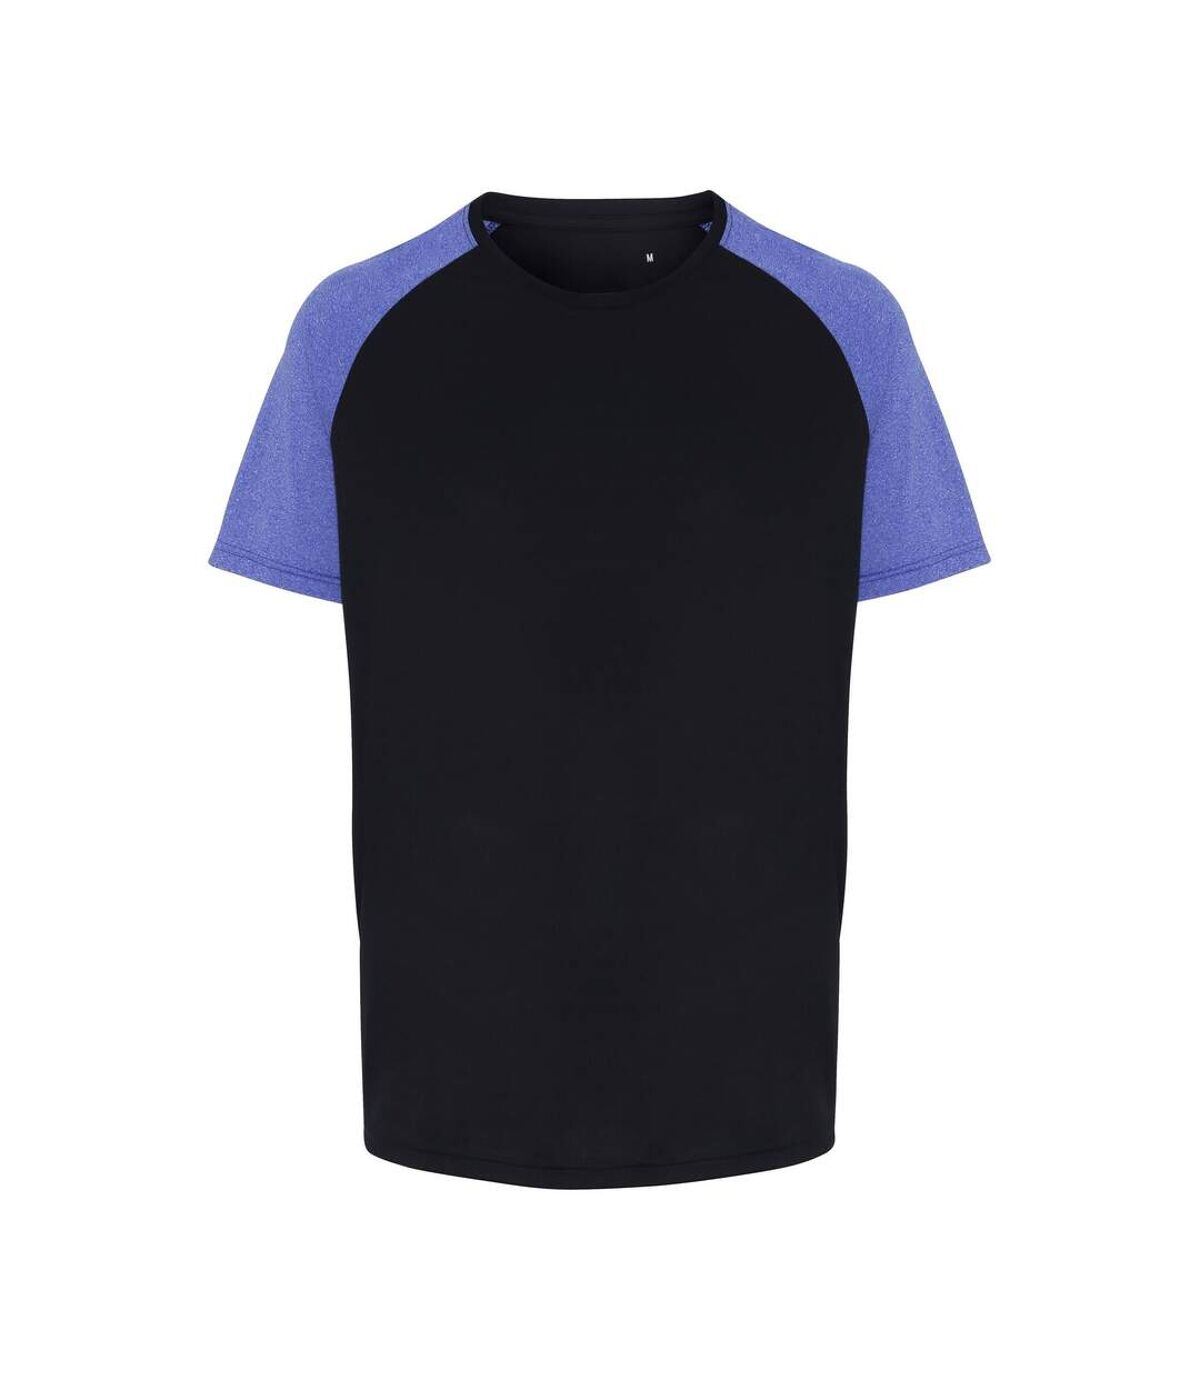 TriDri Mens Contrast Sleeve Performance T-shirt (Navy/Blue Melange) - UTRW6533